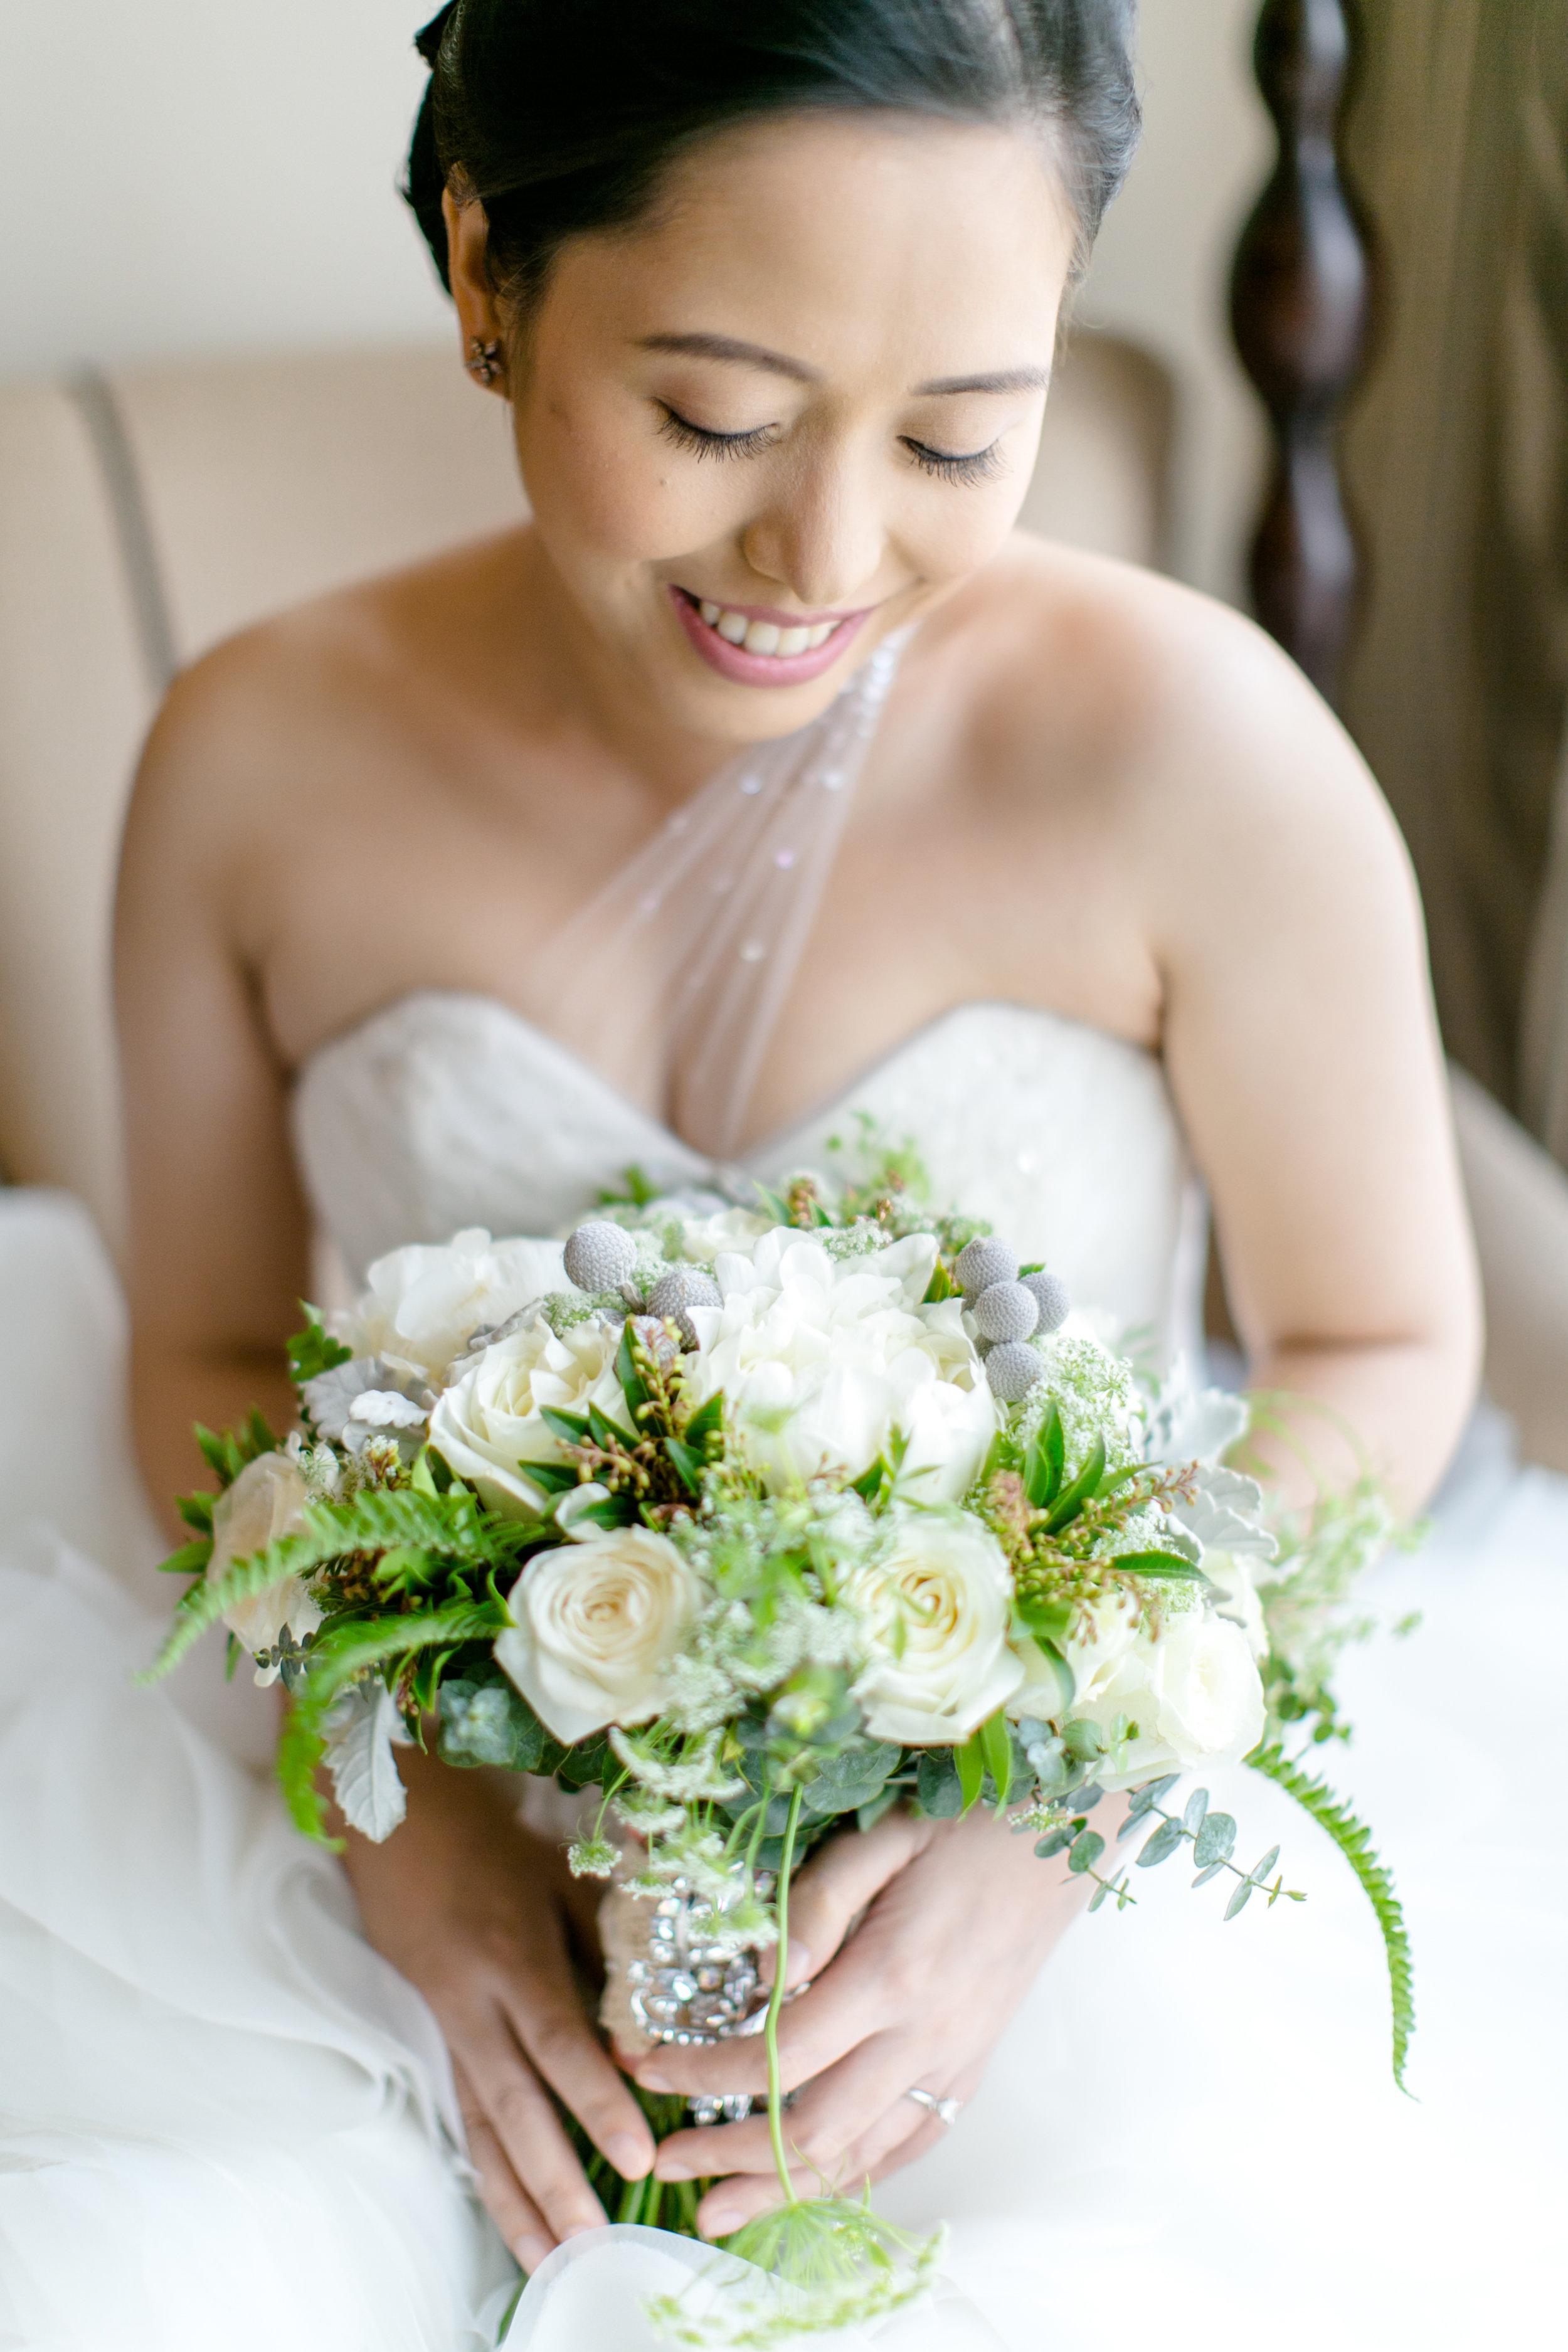 Bridal Bouquet by Vatel Manila